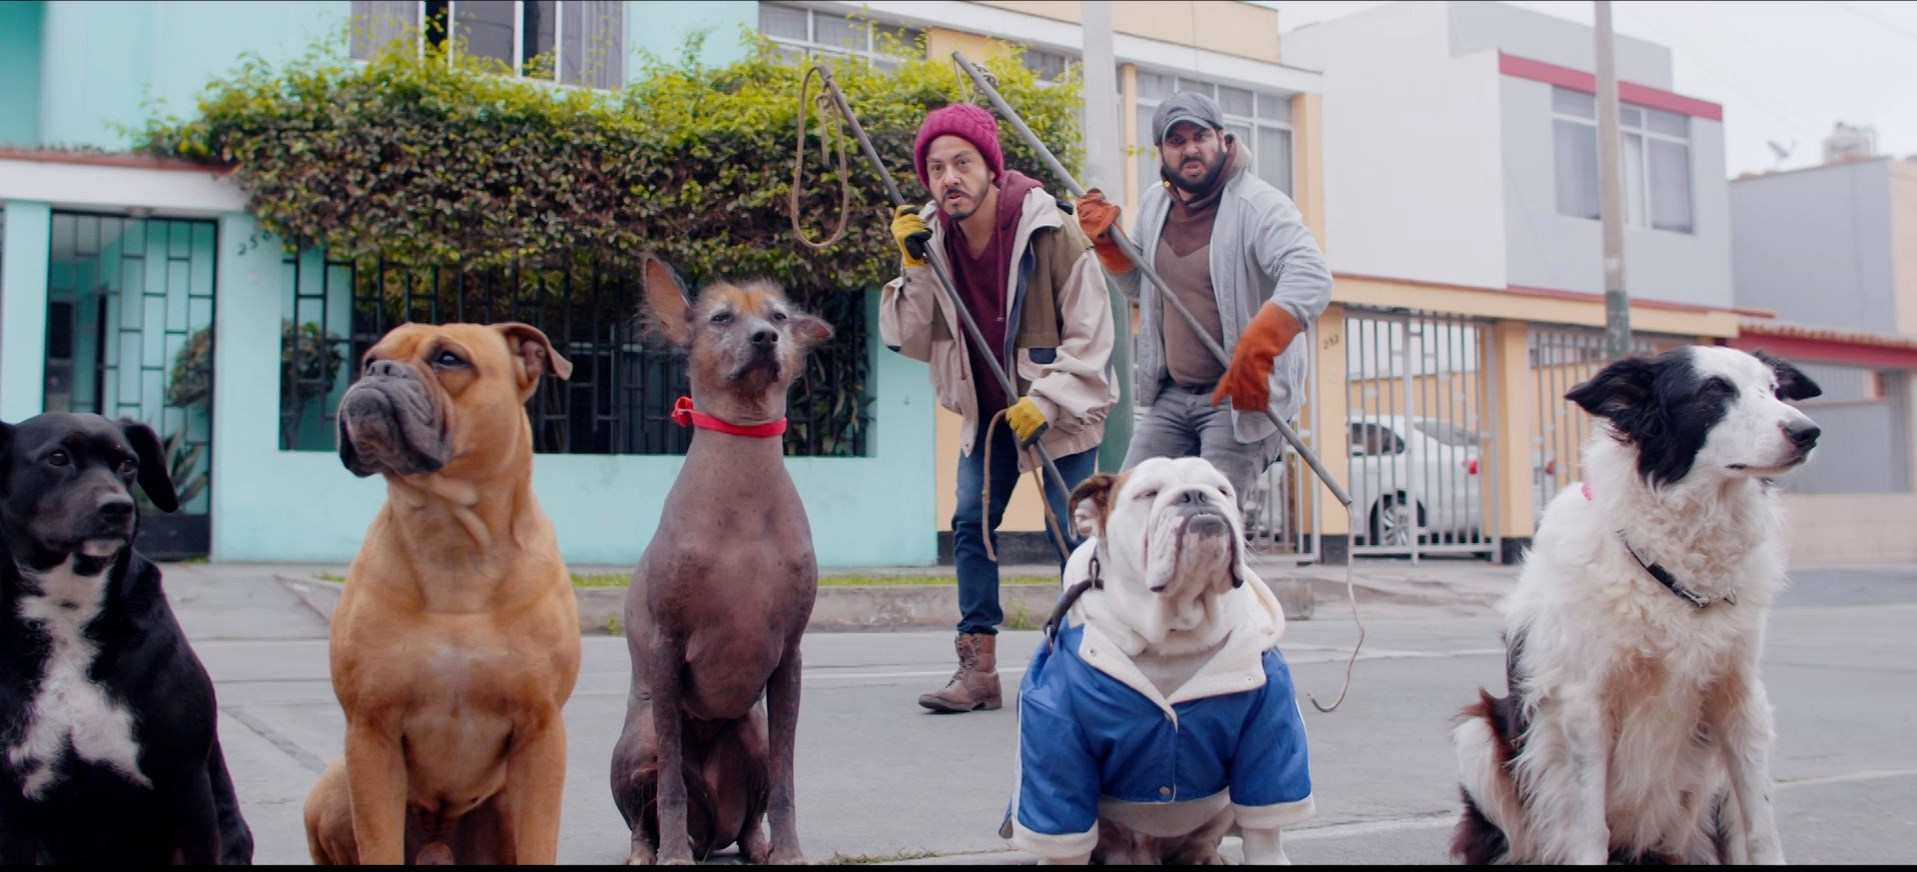 De patitas a la calle (2020) 1080p WEB-DL AMZN Latino